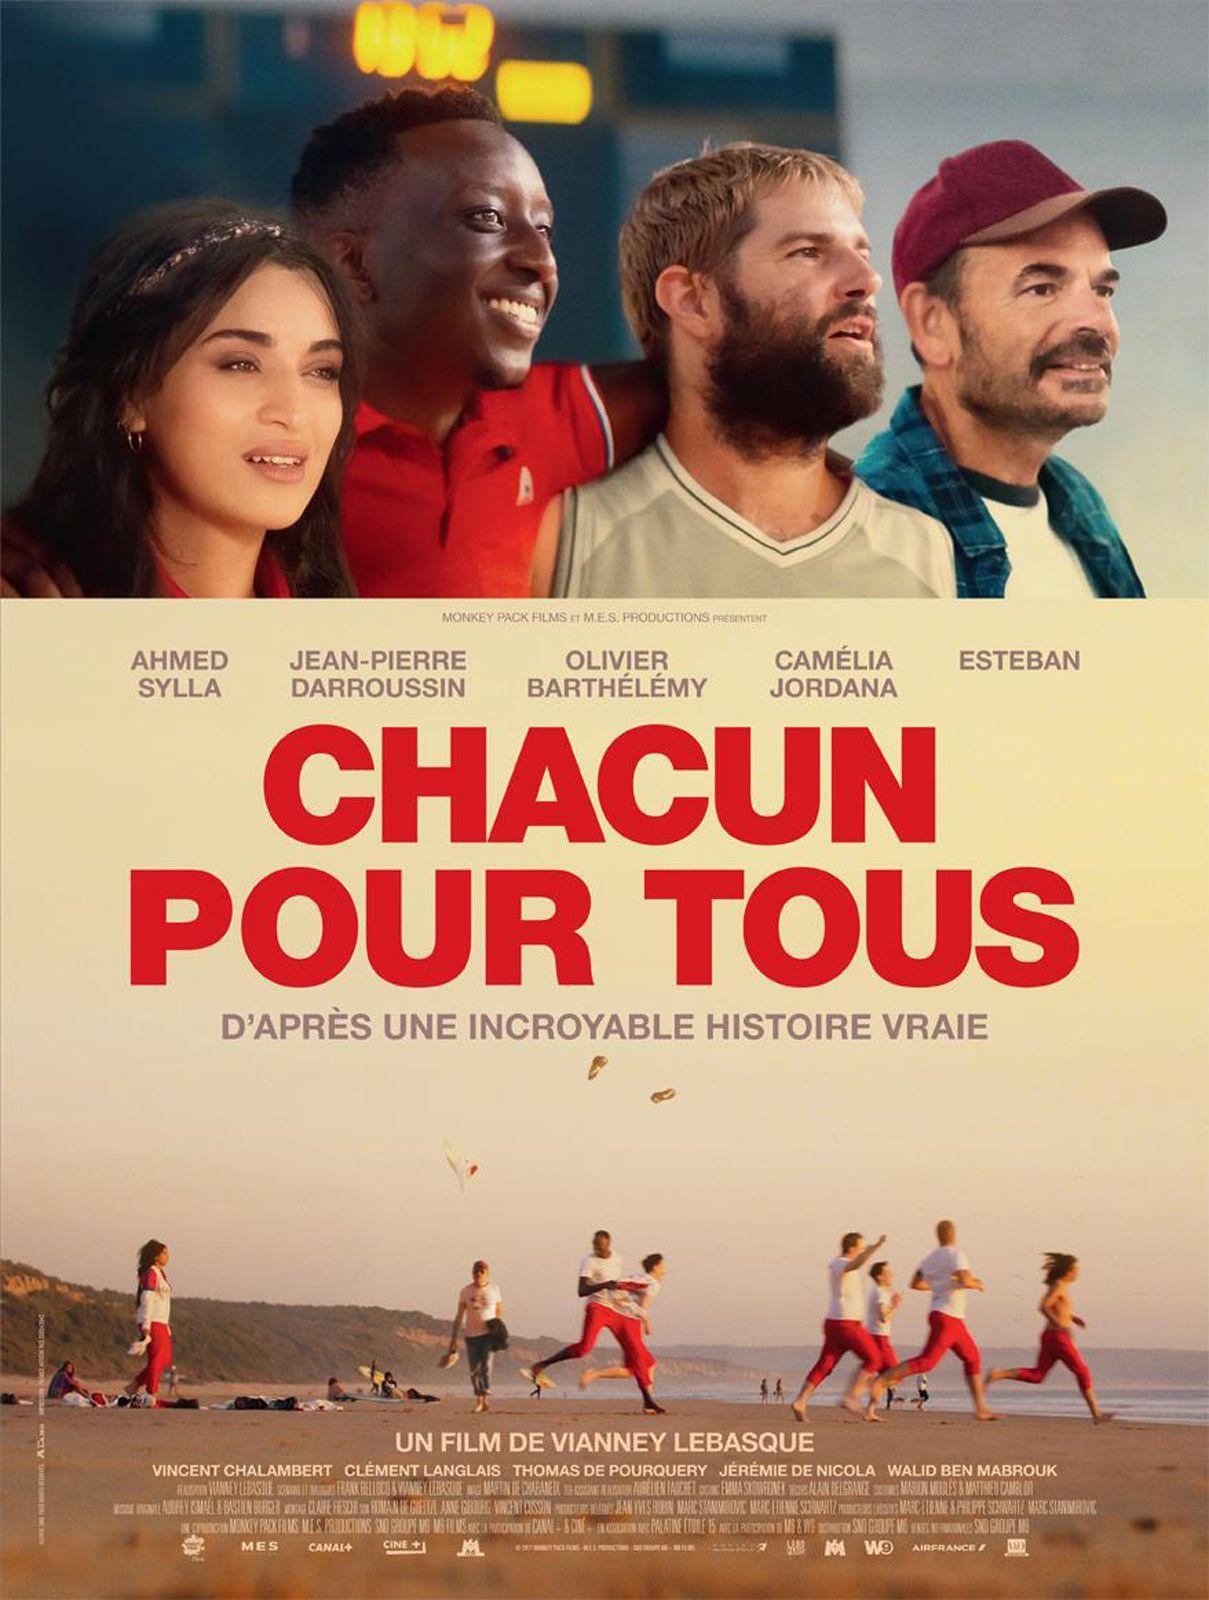 Chacun pour tous - Film (2018)